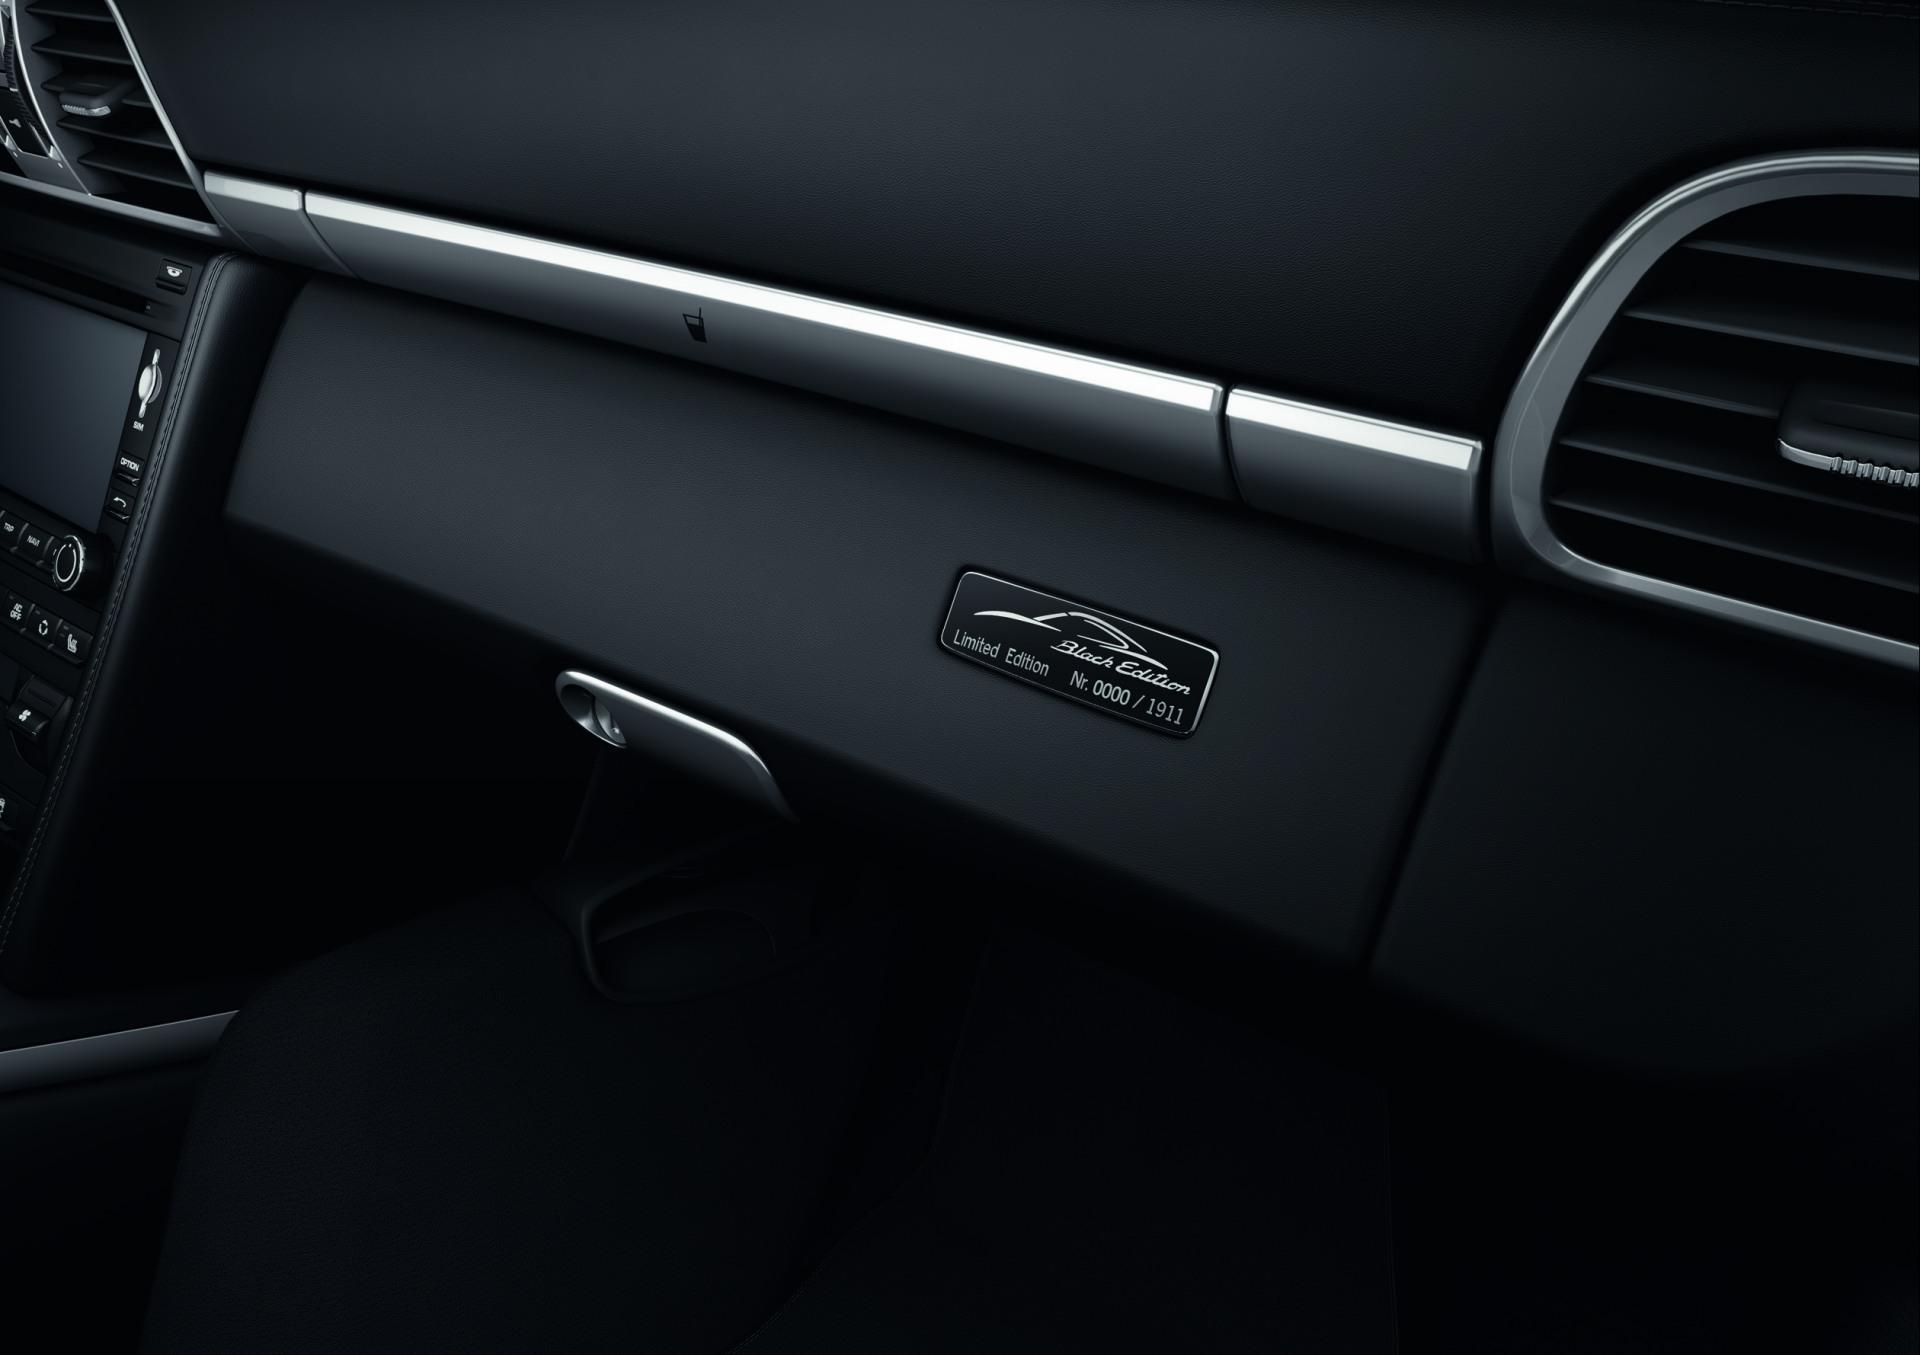 2012 Porsche 911 Black Edition Carrera